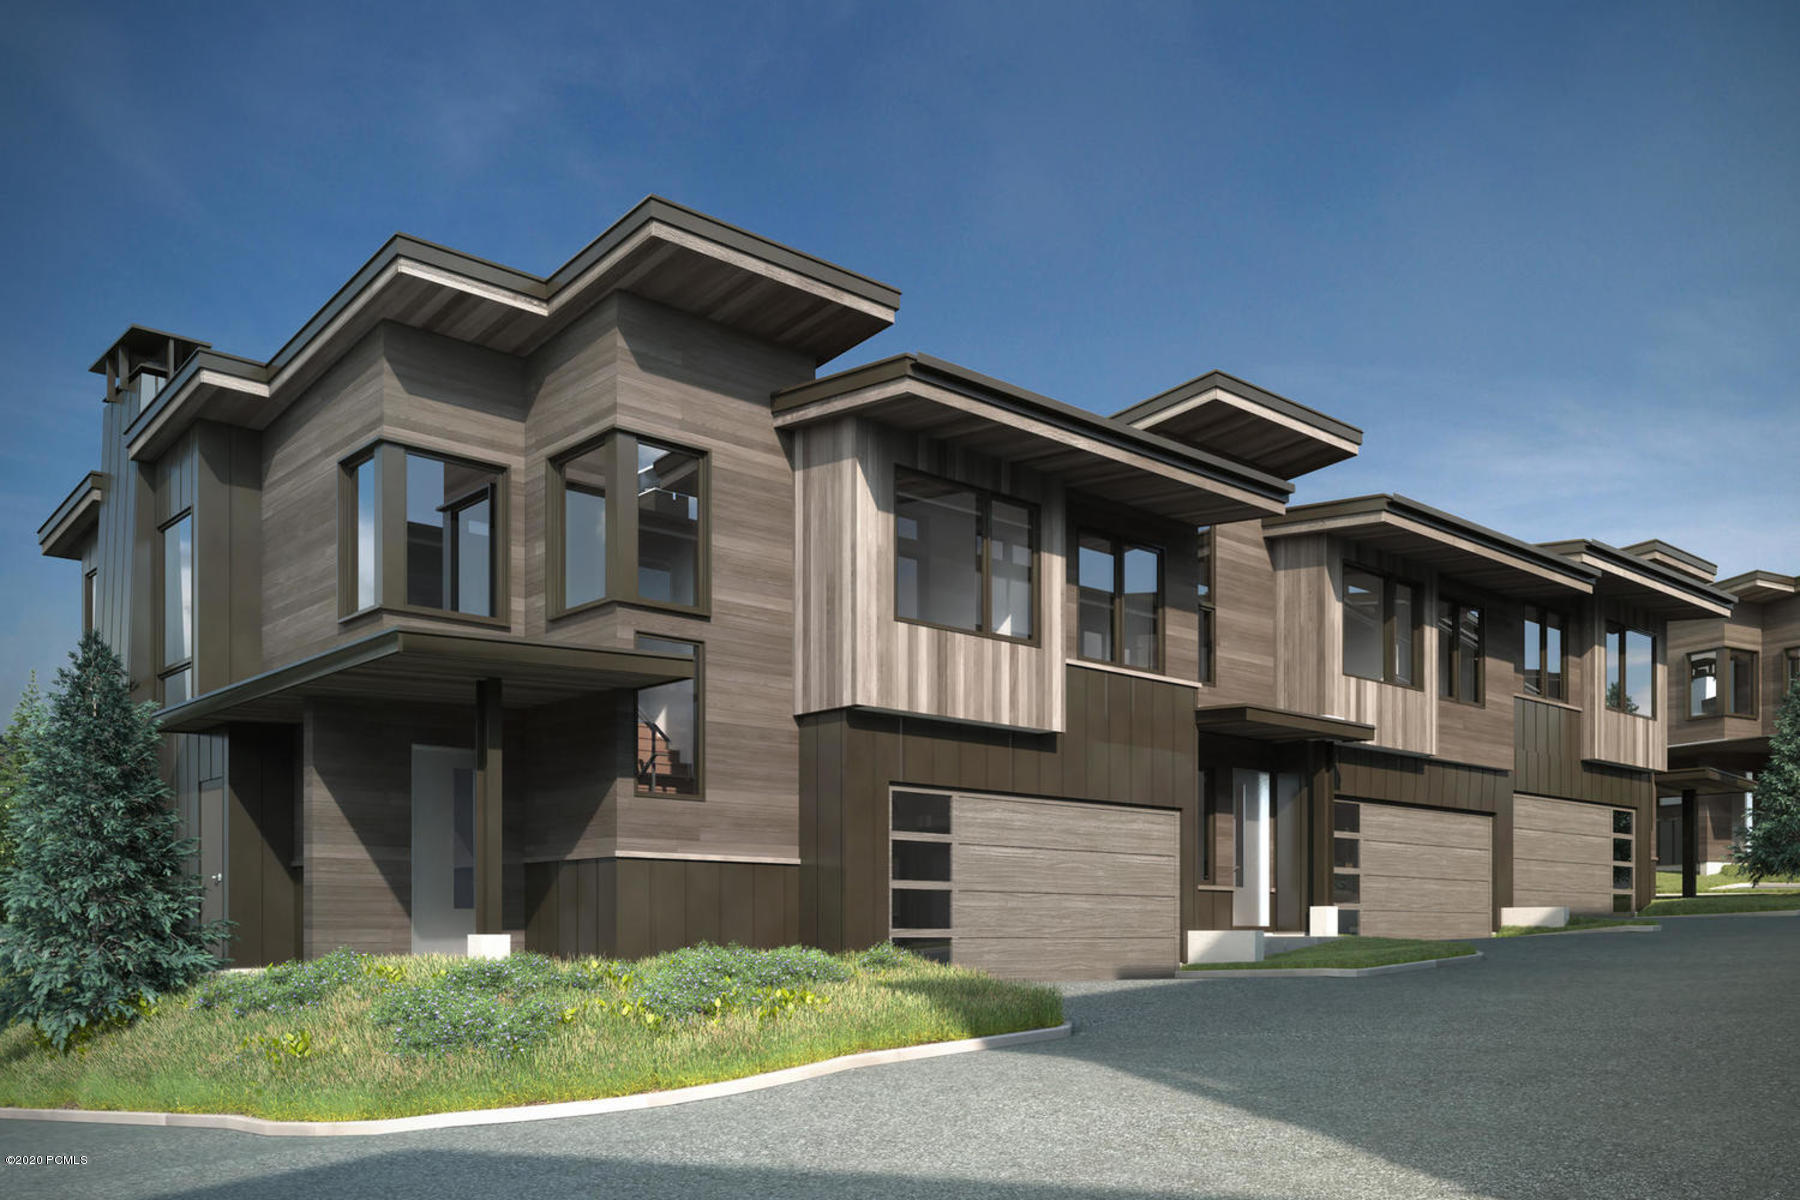 3554 Ridgeline Drive, Park City, Utah 84098, 5 Bedrooms Bedrooms, ,6 BathroomsBathrooms,Condominium,For Sale,Ridgeline,12002690